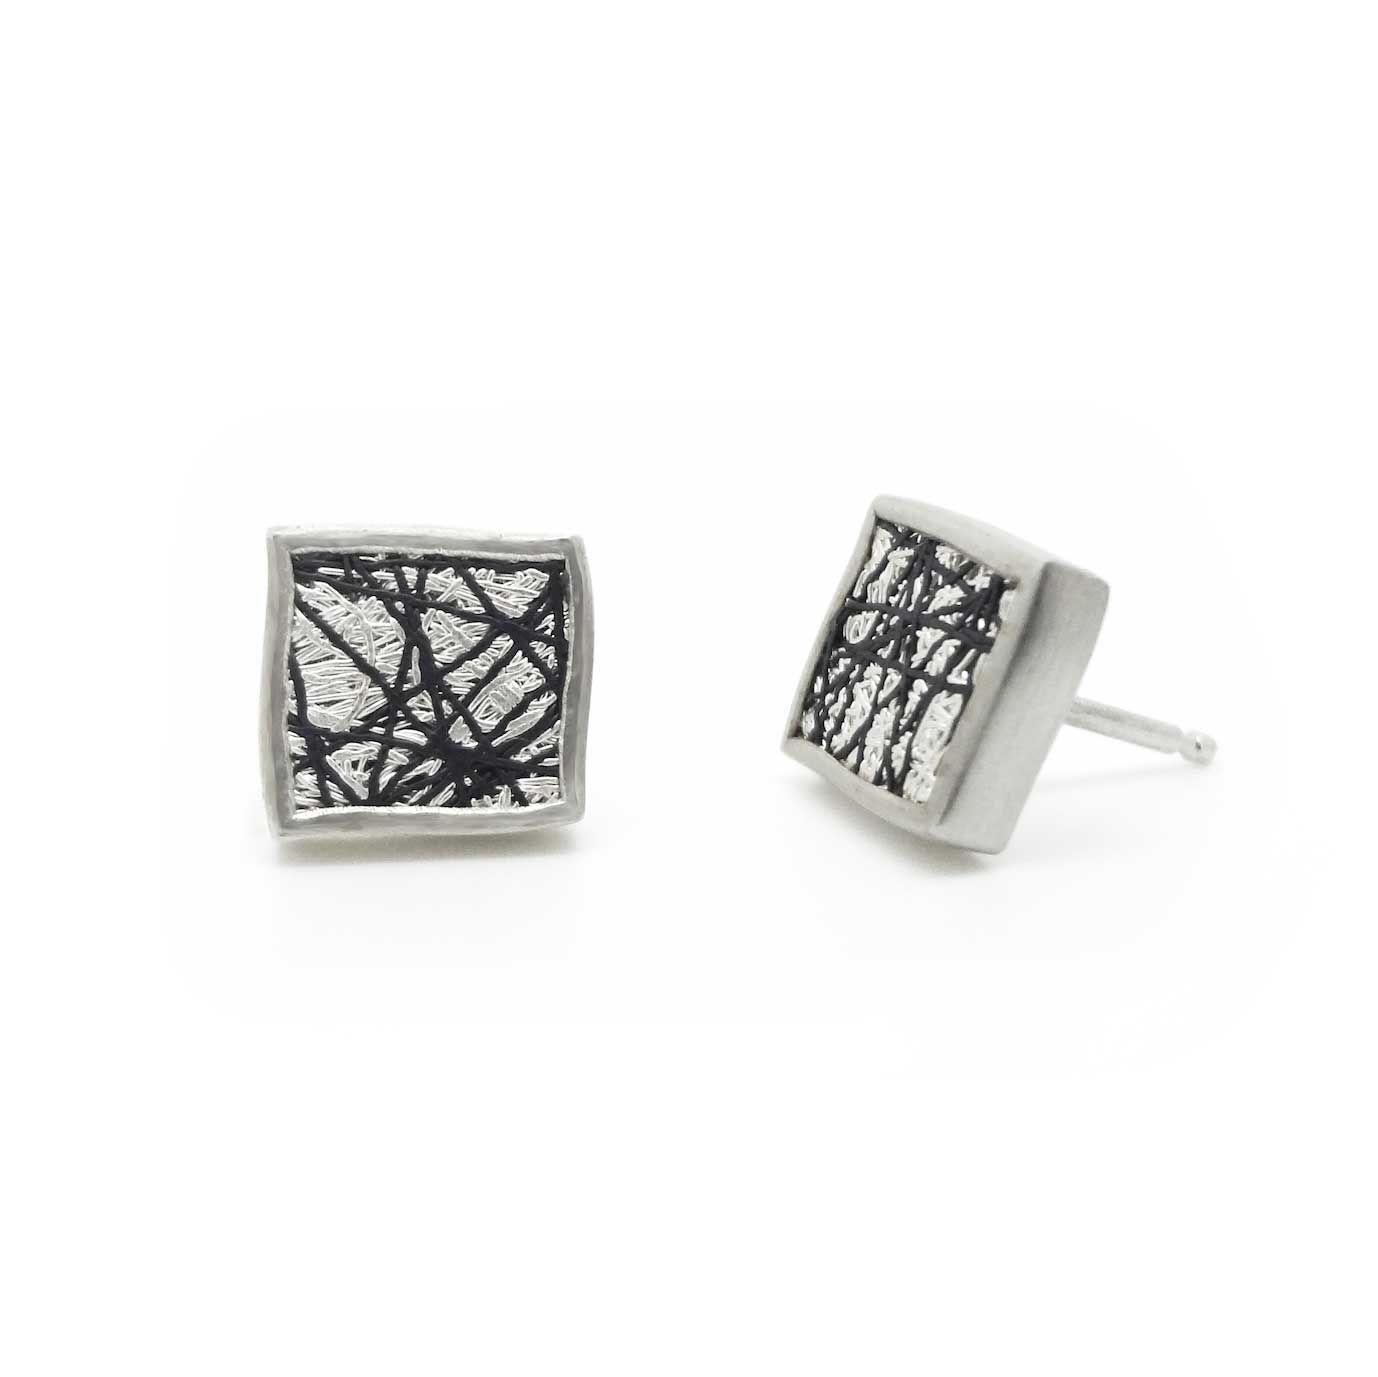 c82ea109e ORRO.co.uk - Gill Galloway Whitehead – Silver Stud Earrings - ORRO  Contemporary Jewellery Glasgow.